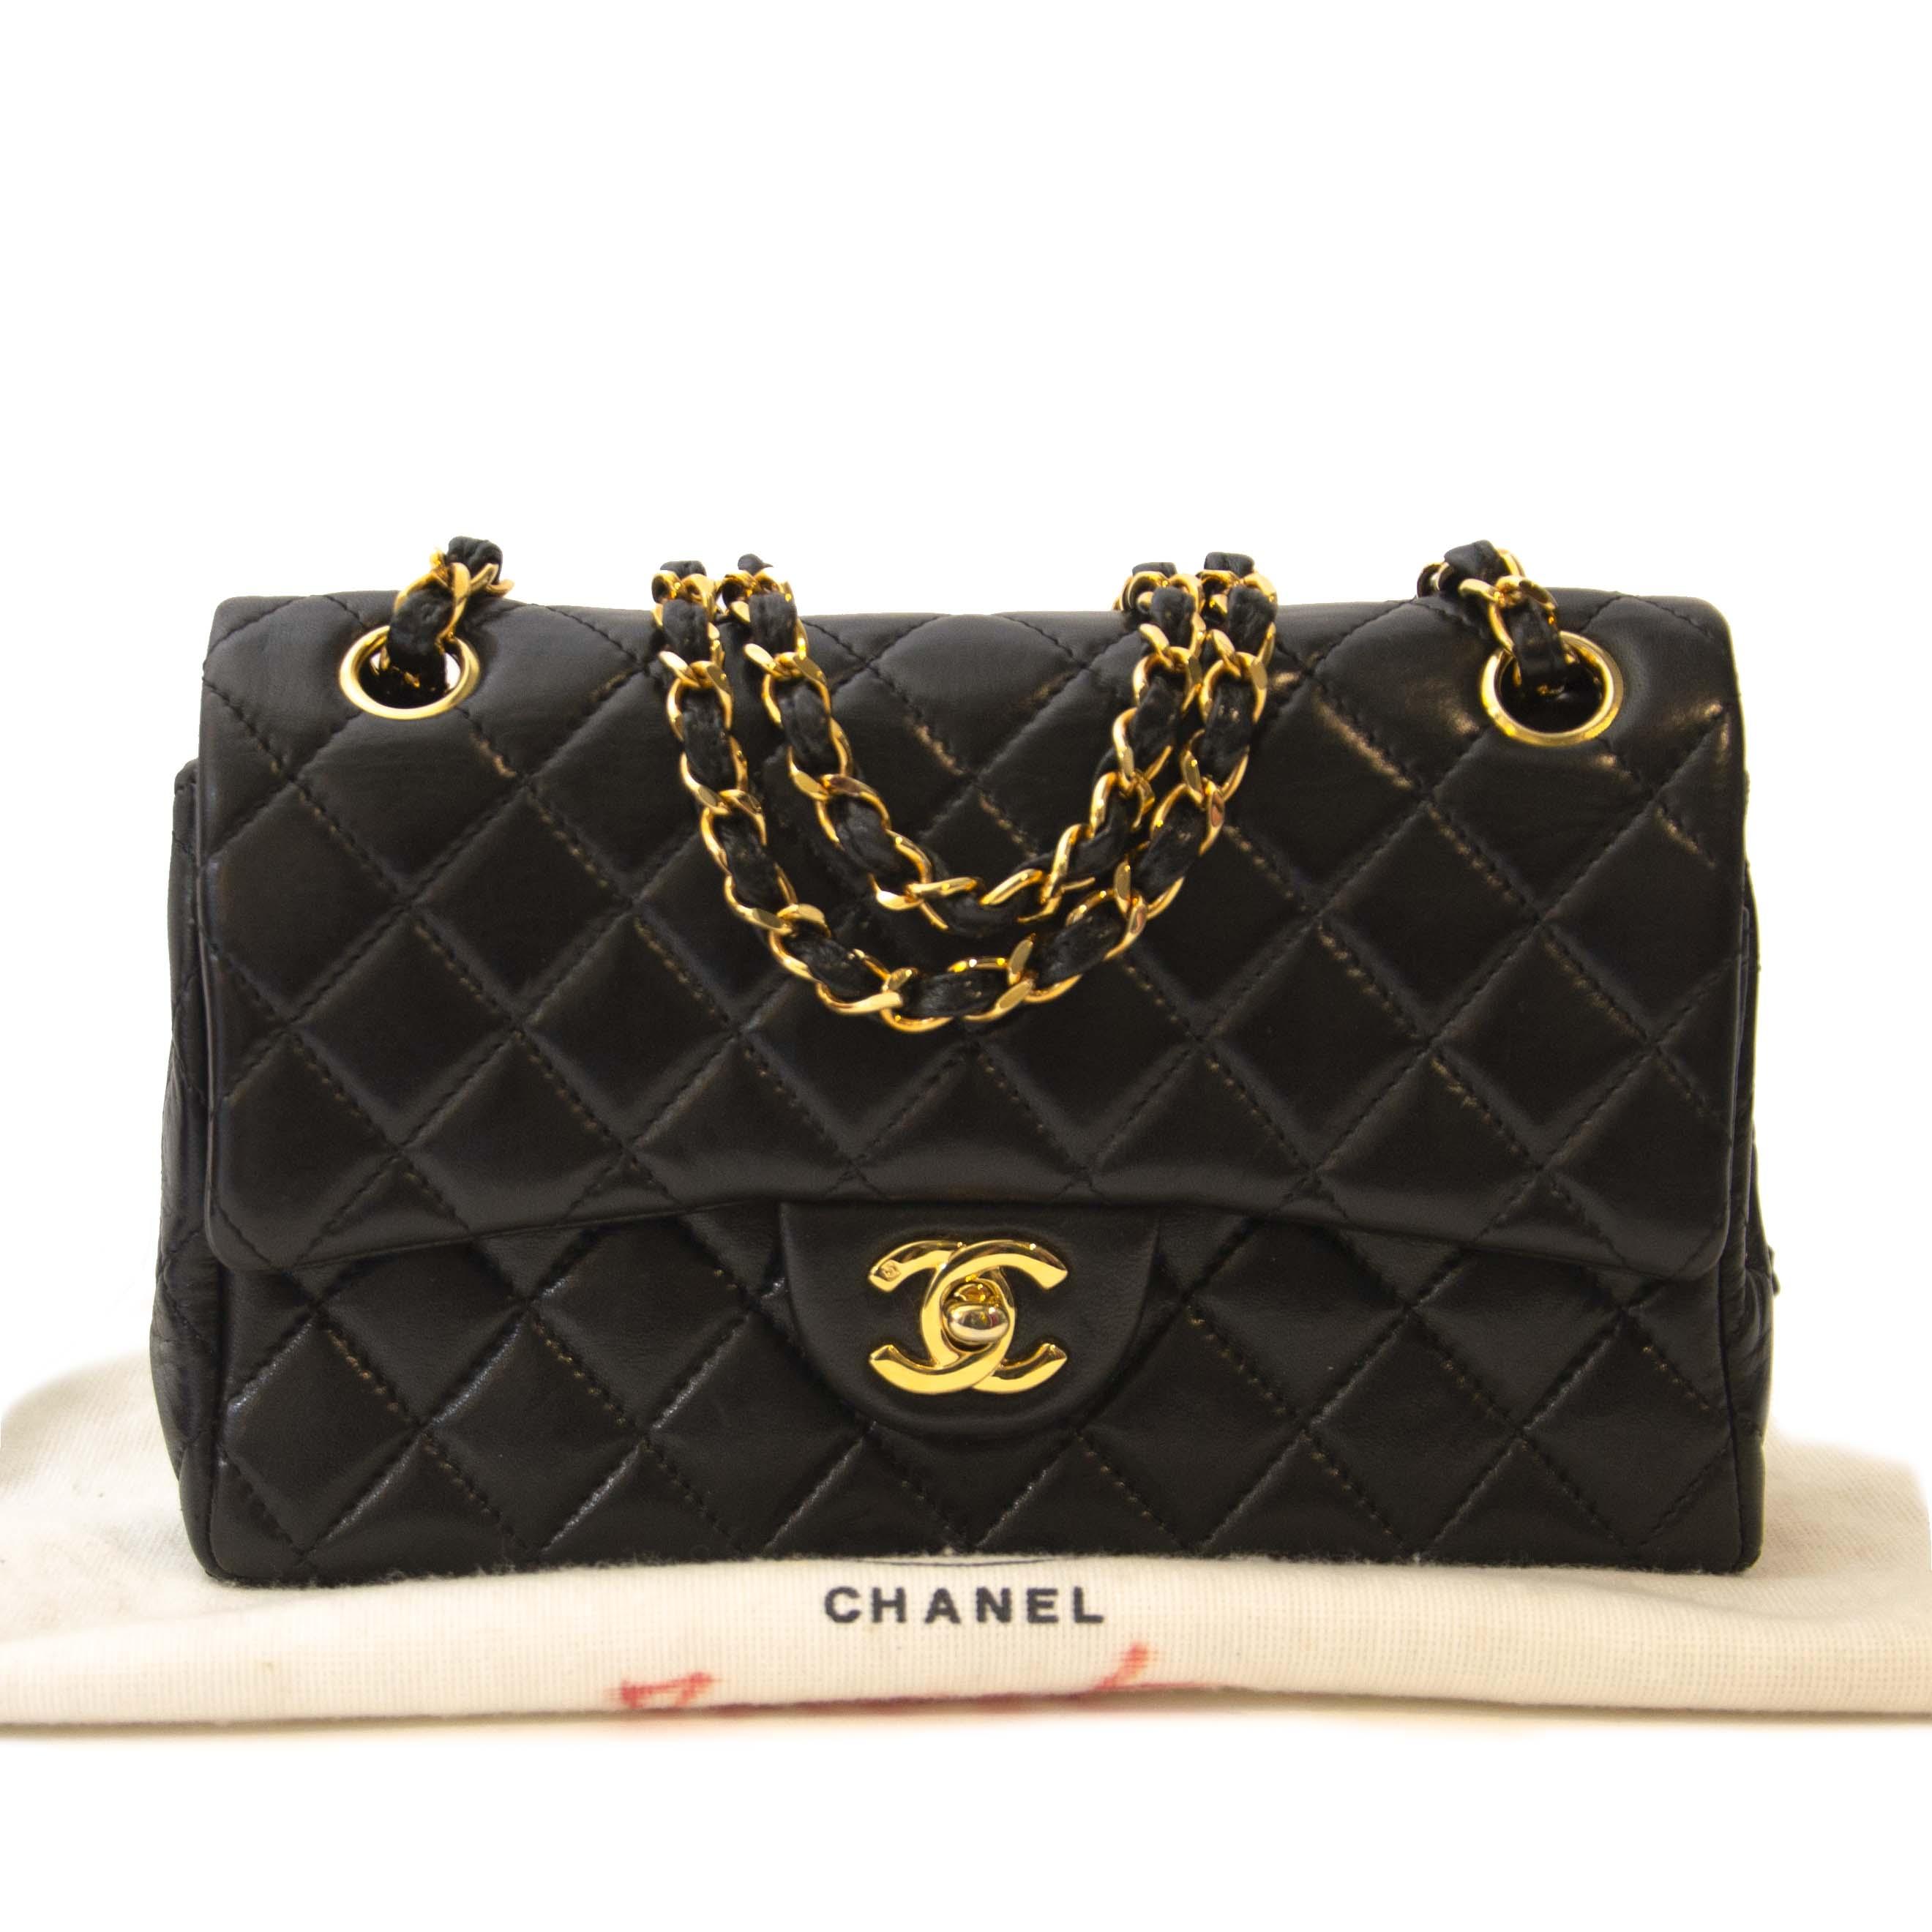 f8067afecaf0 ... koop veilig online tegen de best prijs Chanel Vintage Black Small  Classic Double Flap Bag